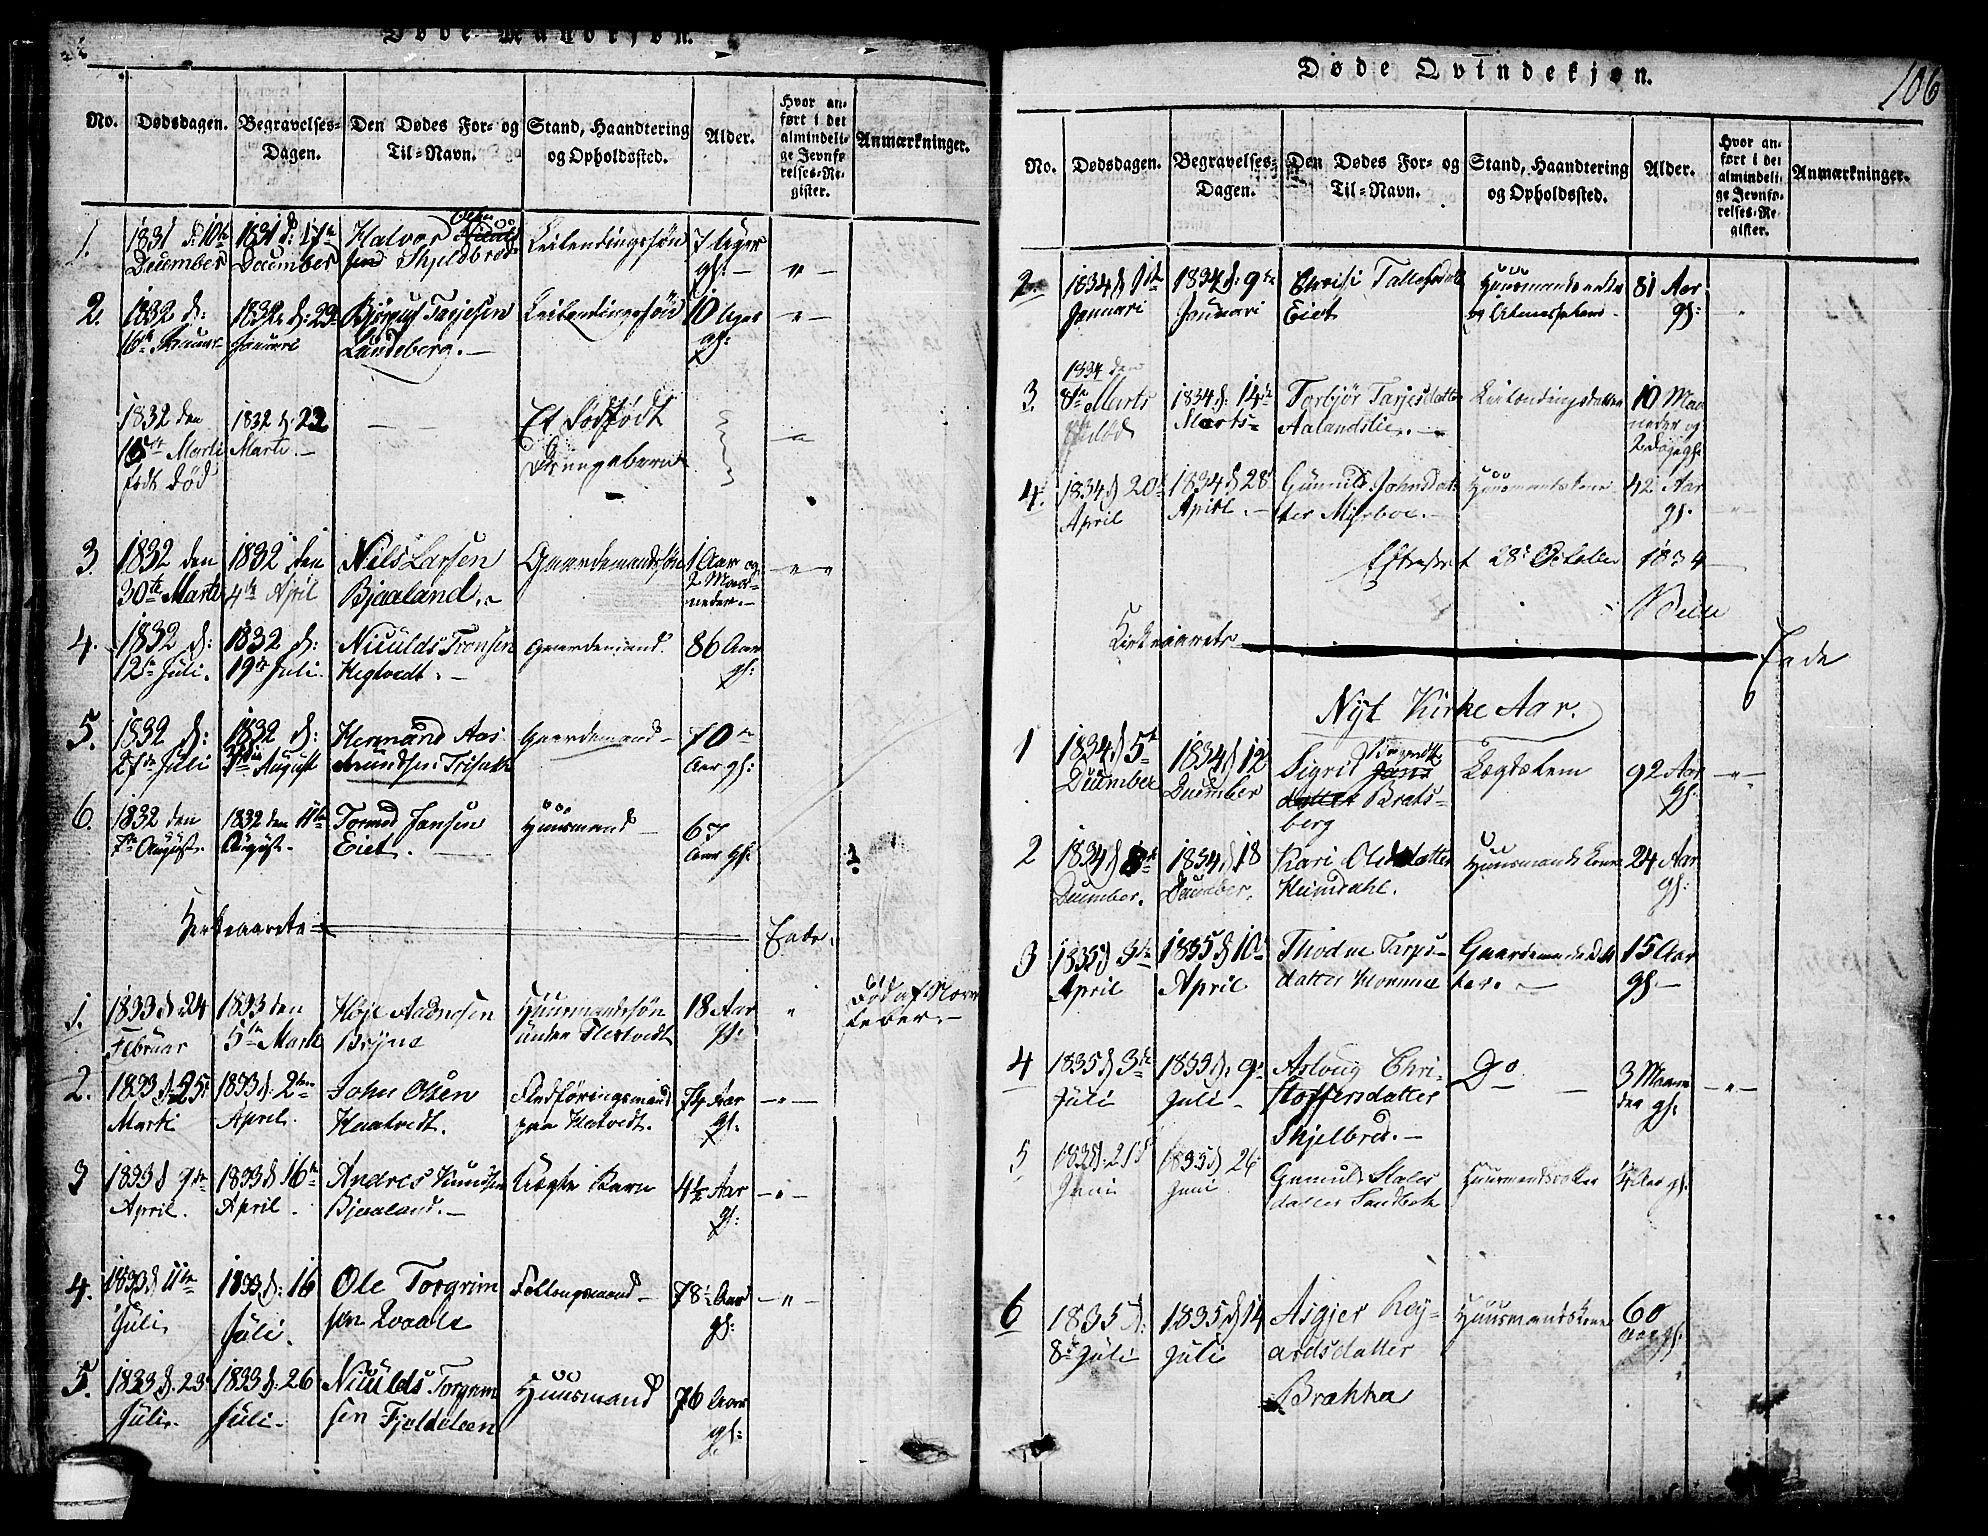 SAKO, Lårdal kirkebøker, G/Ga/L0001: Klokkerbok nr. I 1, 1815-1861, s. 106